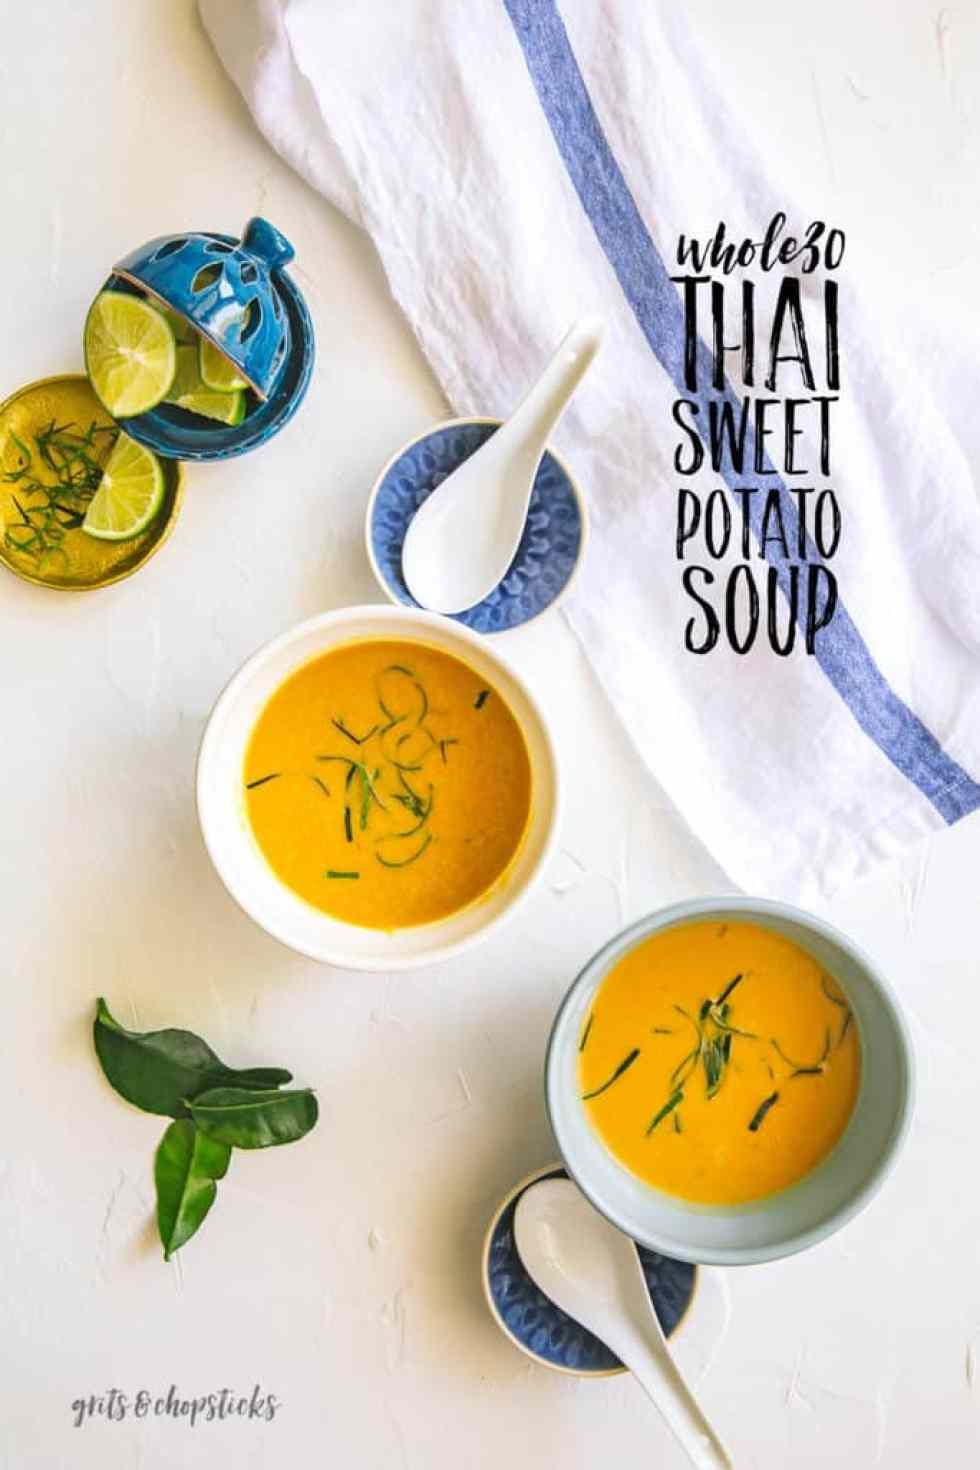 whole30 thai sweet potato soup